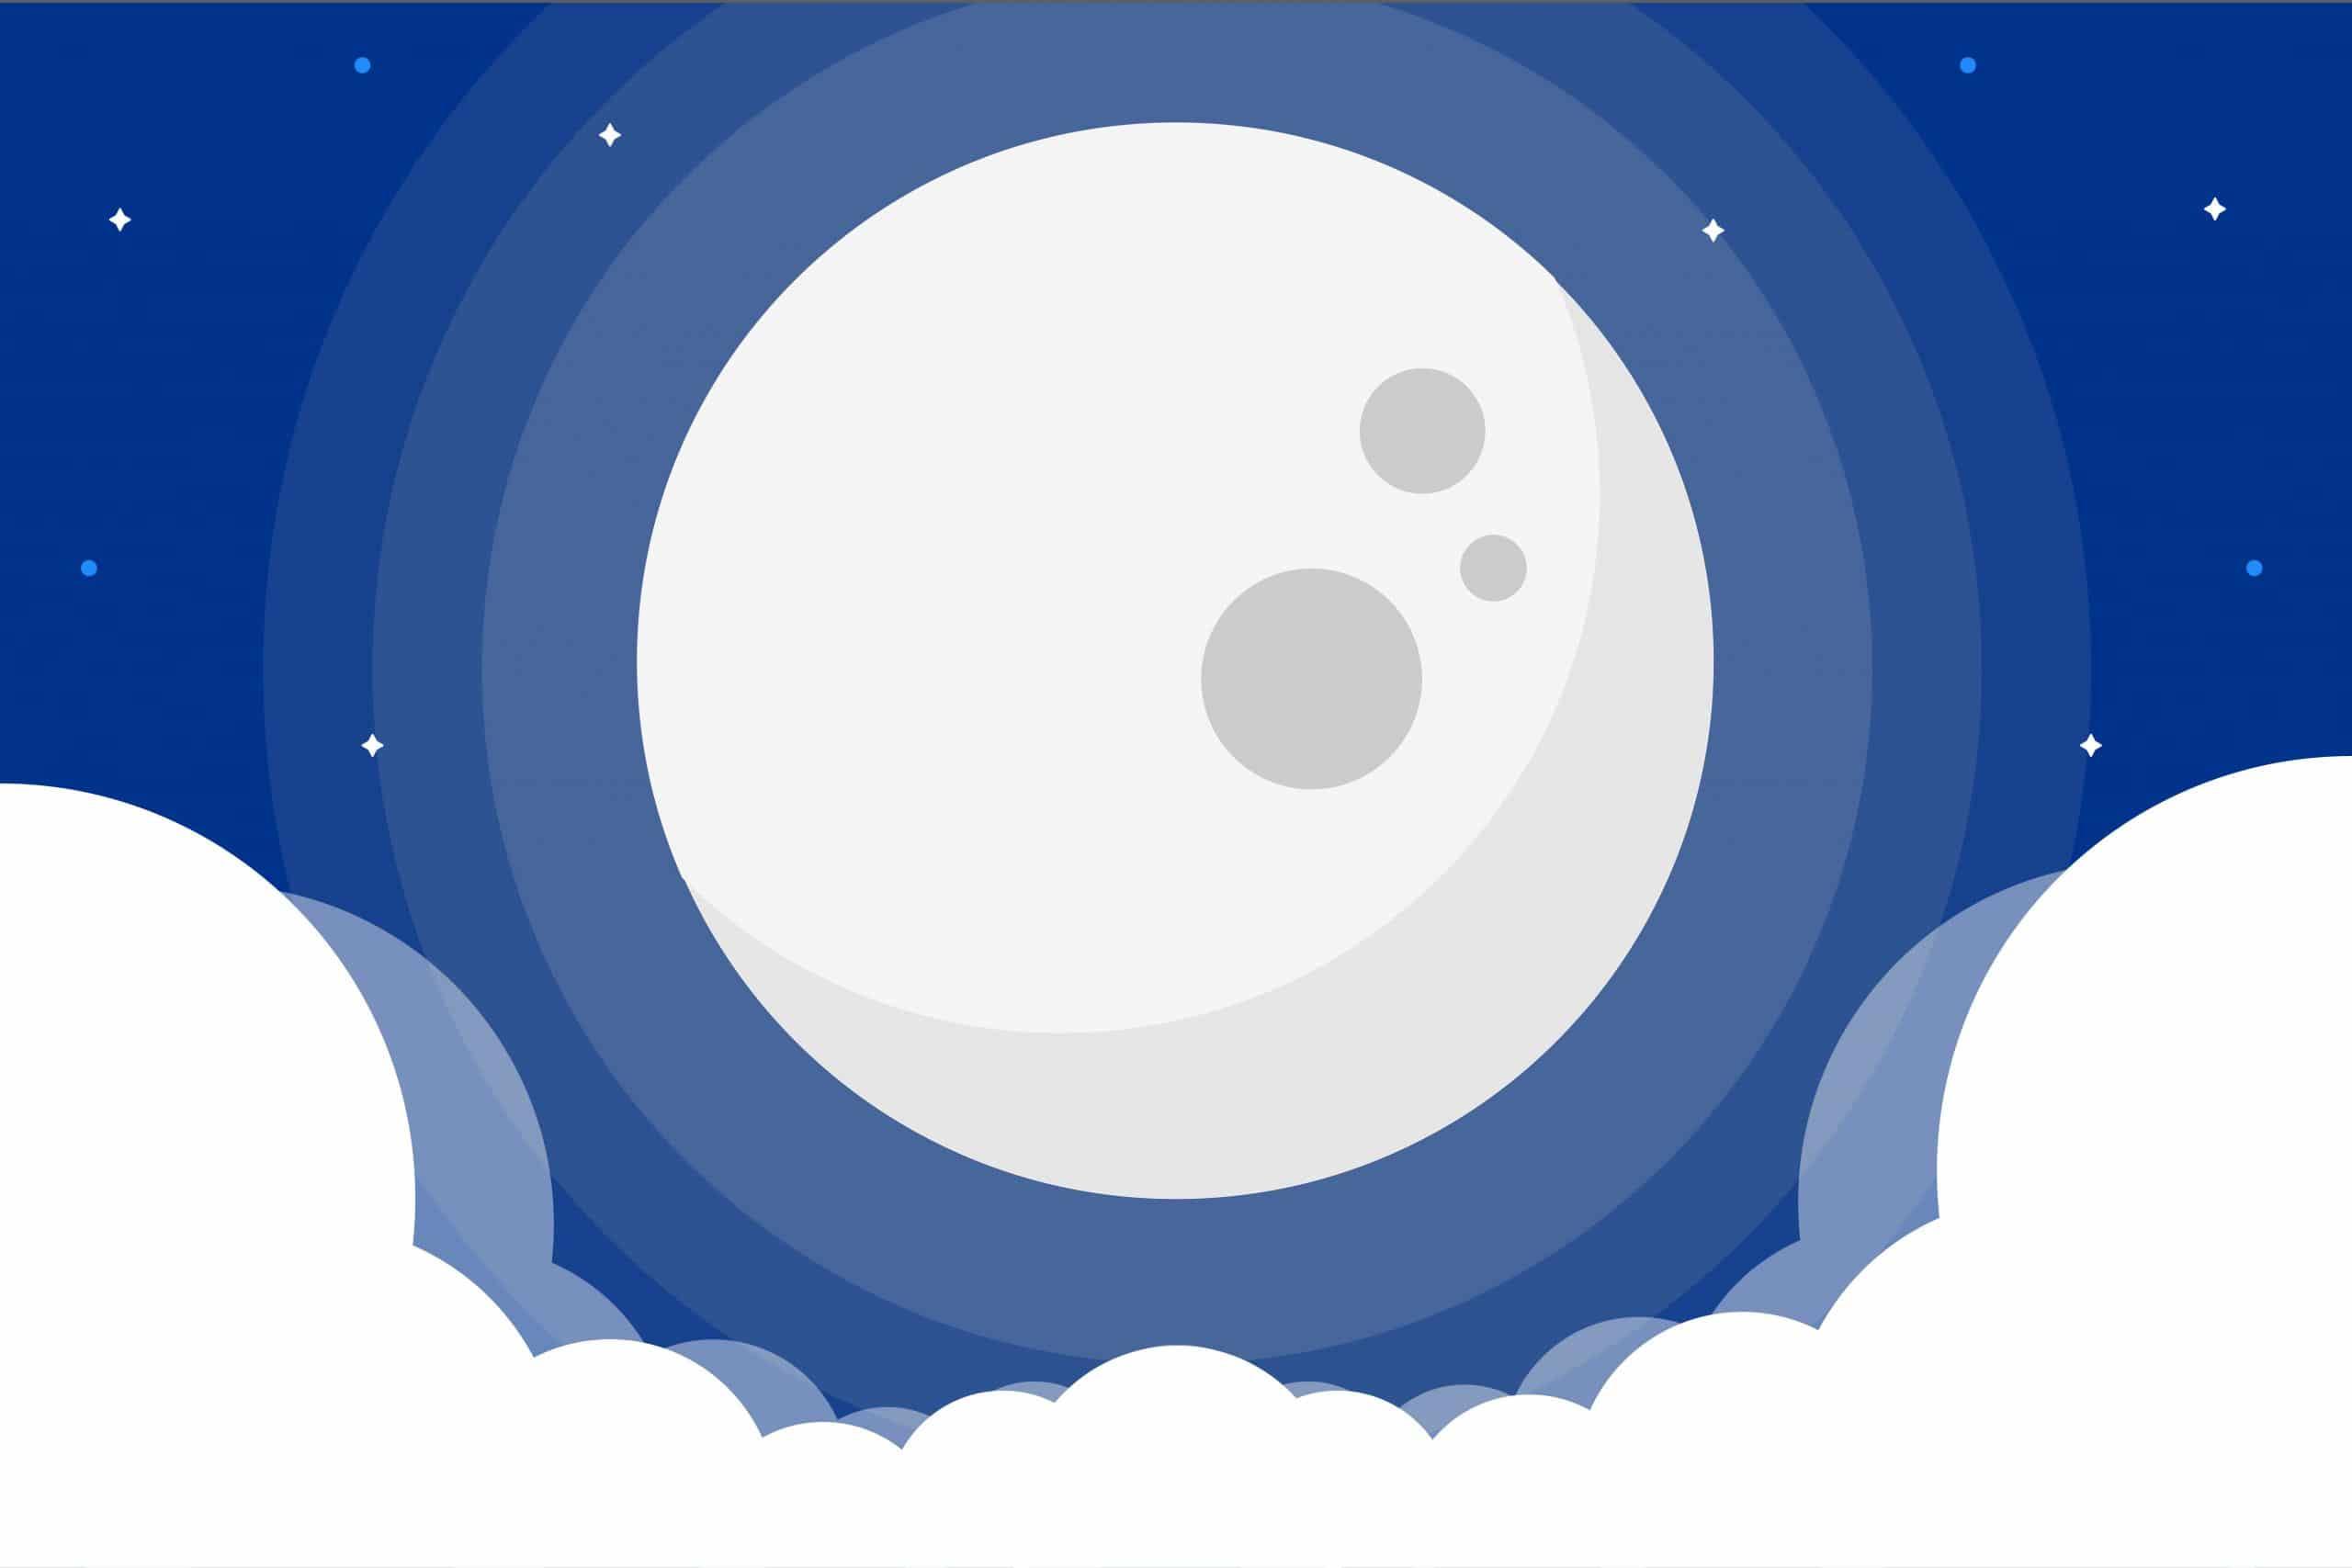 How to Avoid Nightmares & Bad Dreams to Get More Restful Sleep